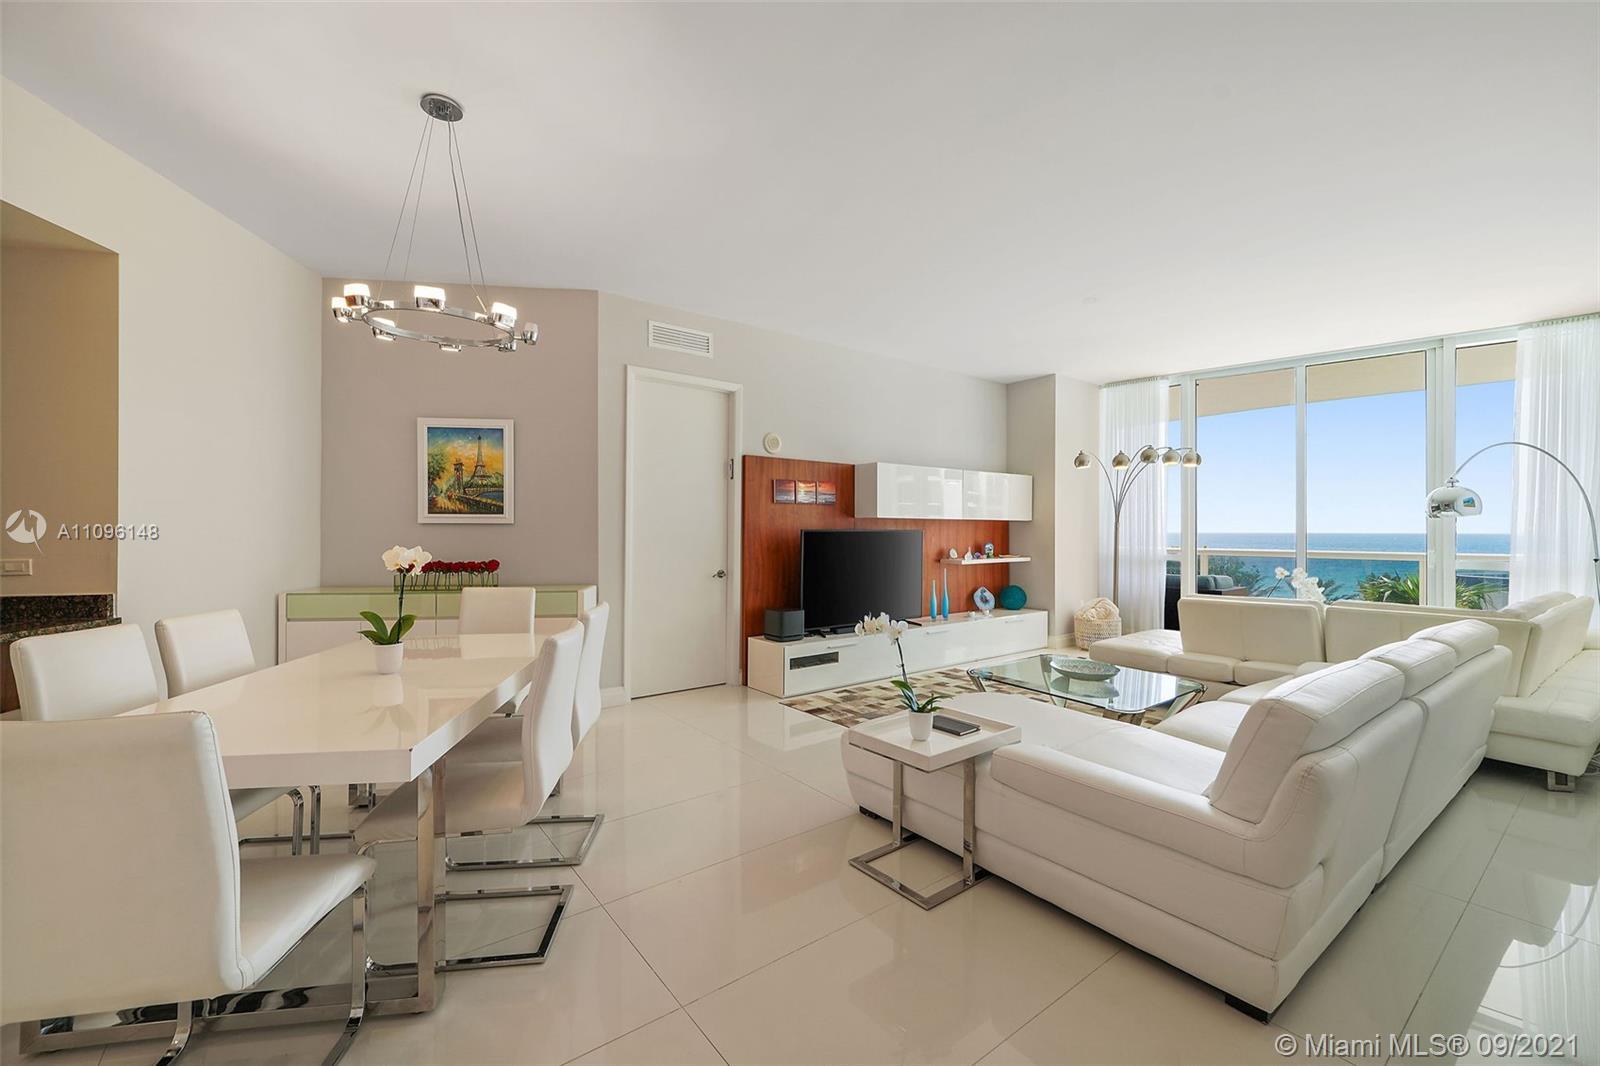 Trump Tower I #507 - 16001 Collins Ave #507, Sunny Isles Beach, FL 33160